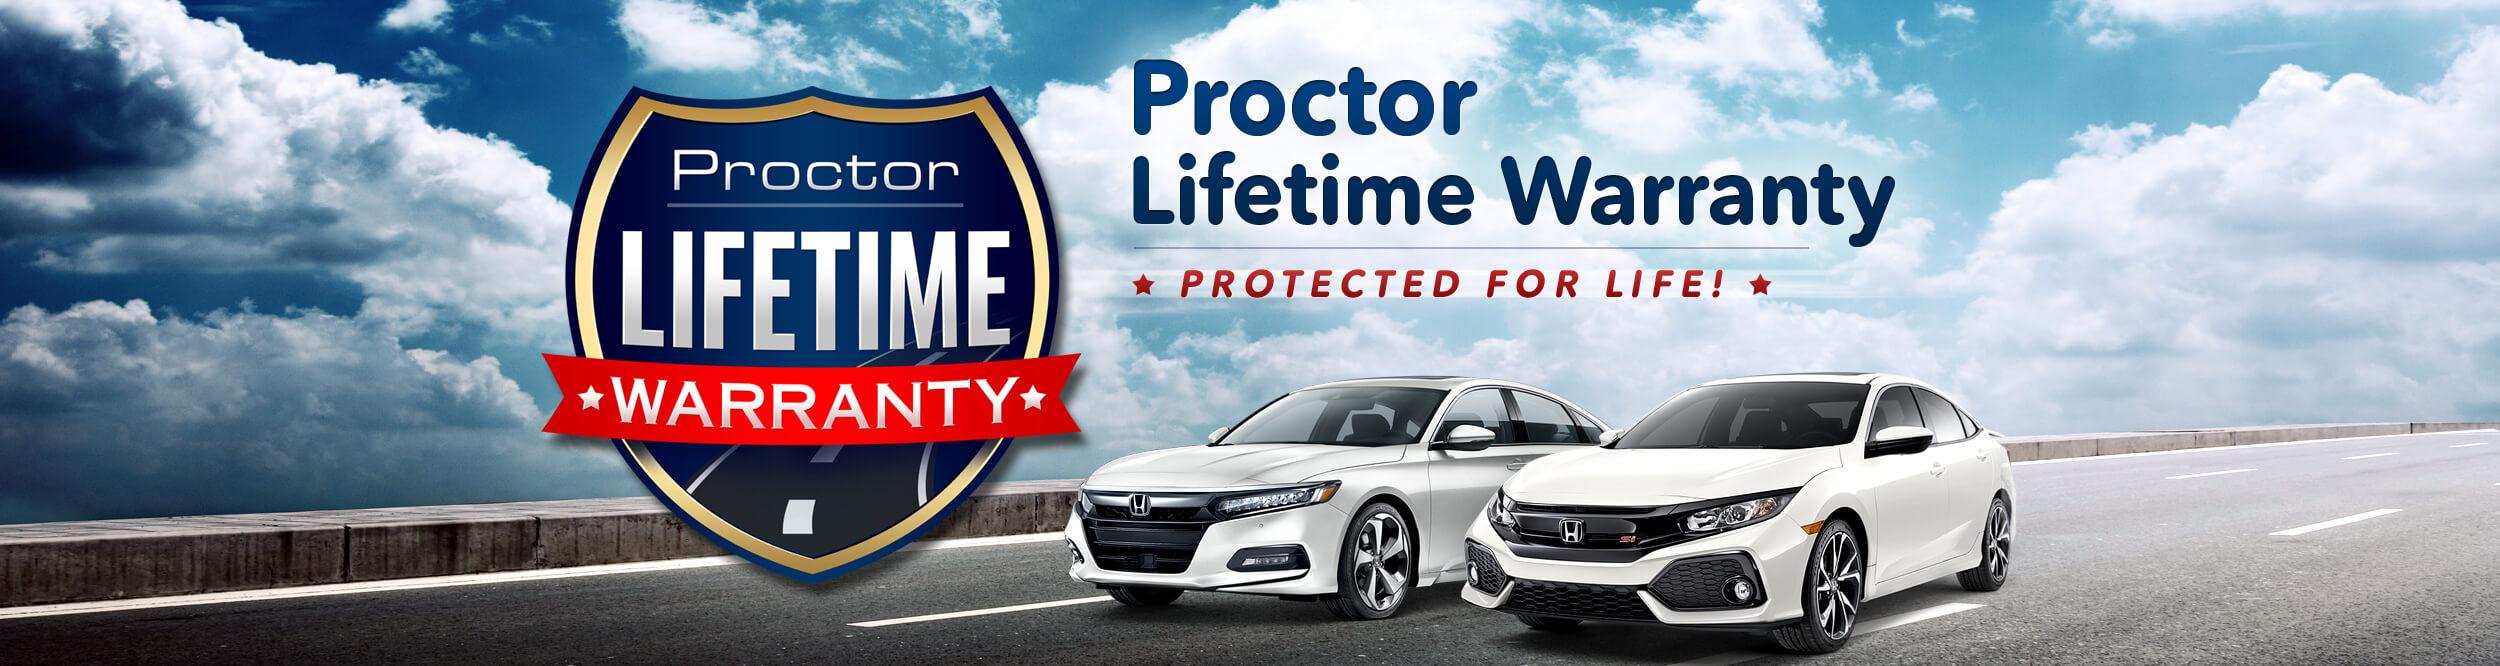 Proctor Honda Proctor Lifetime Warranty